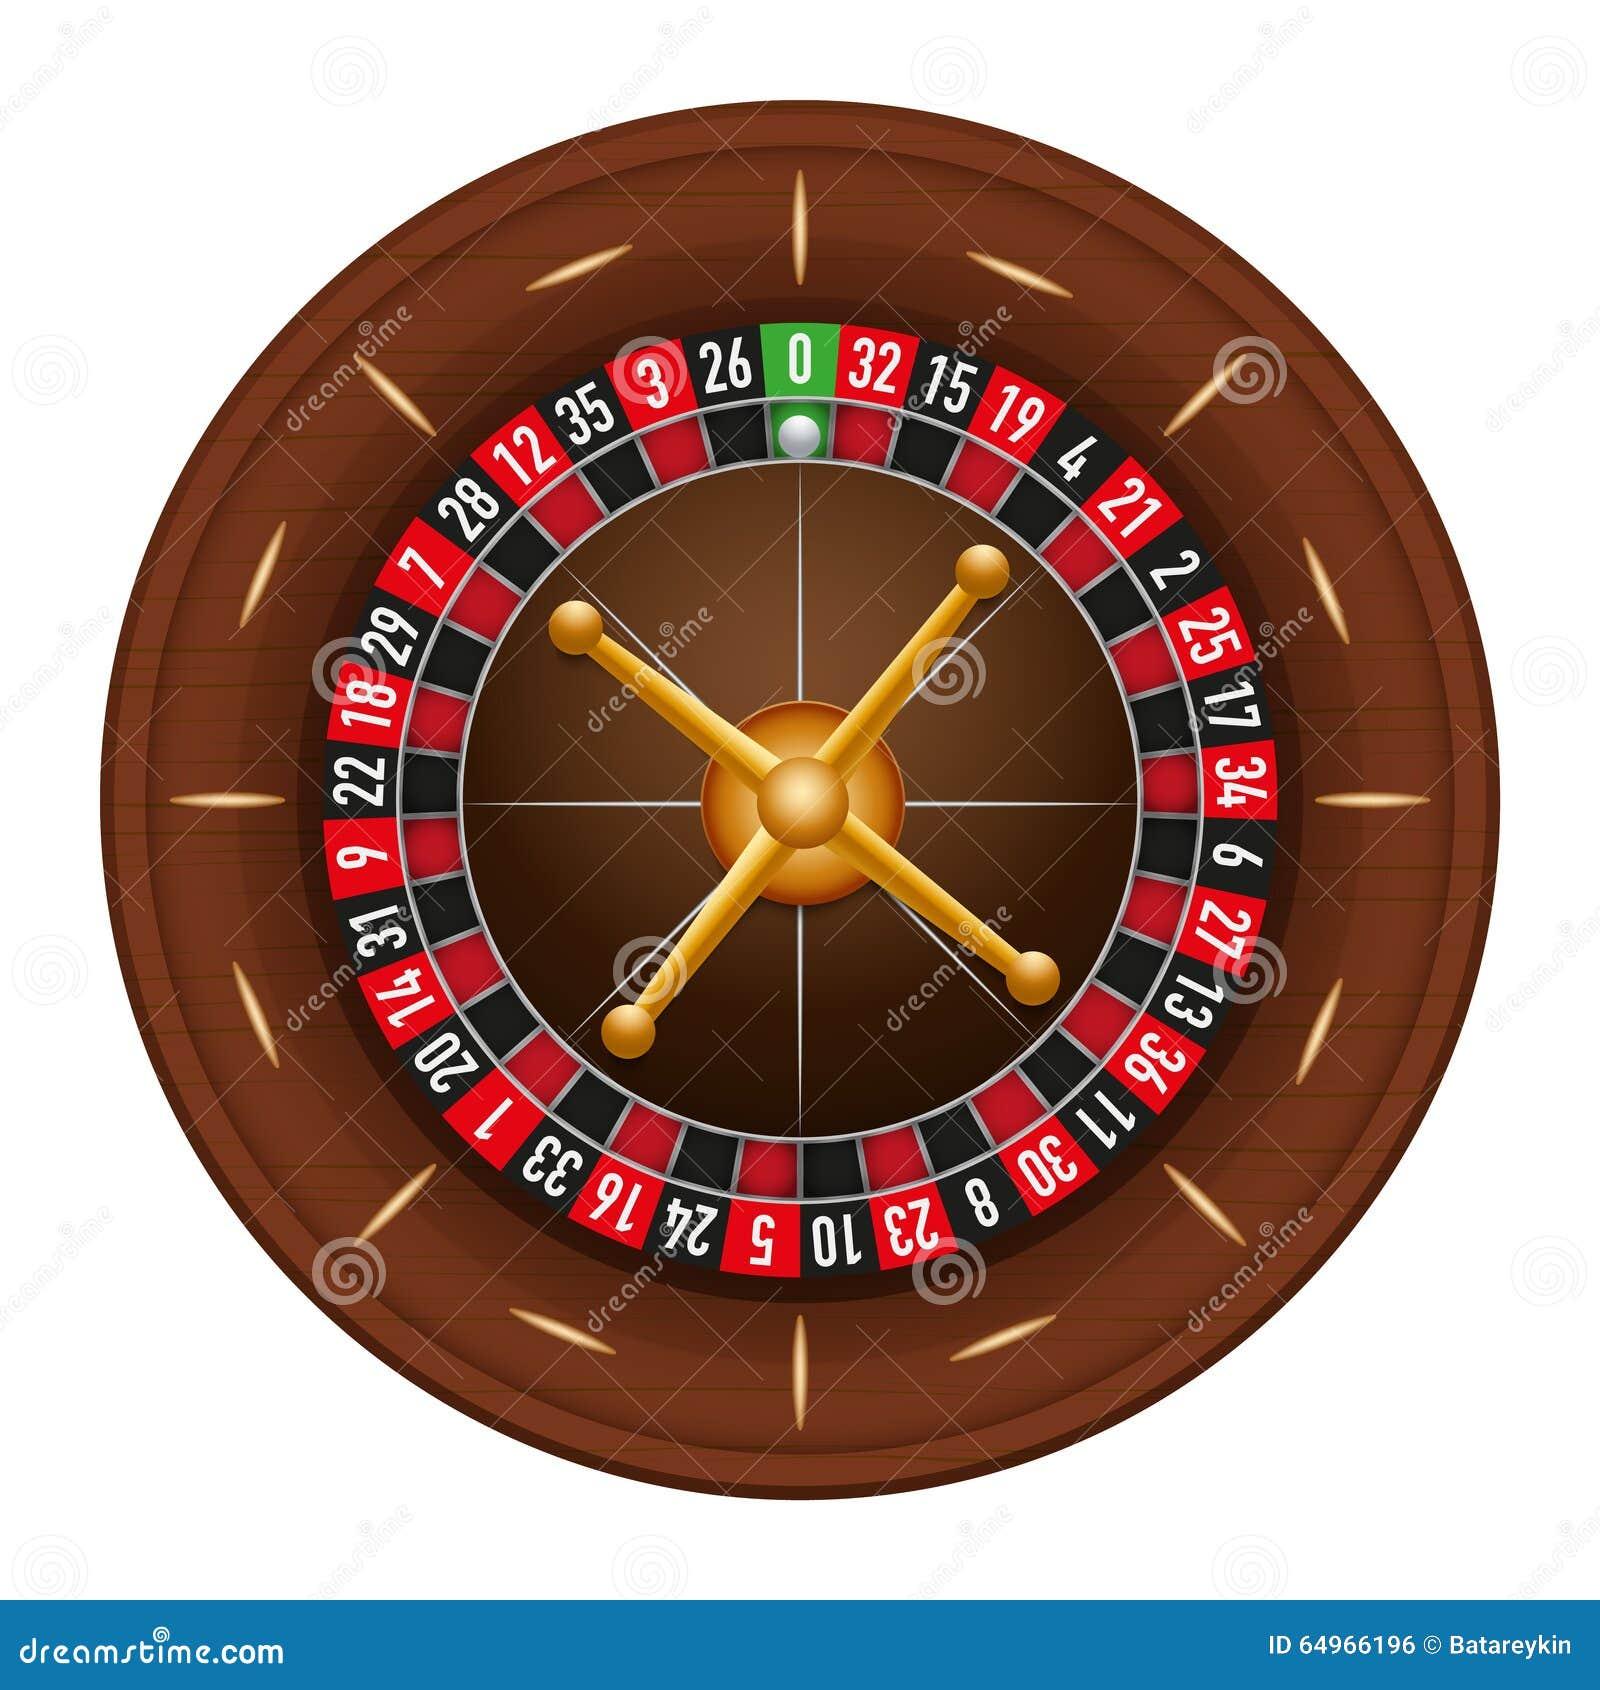 Jugador profesional de ruleta juegos ClubPlayerCasino com - 81947